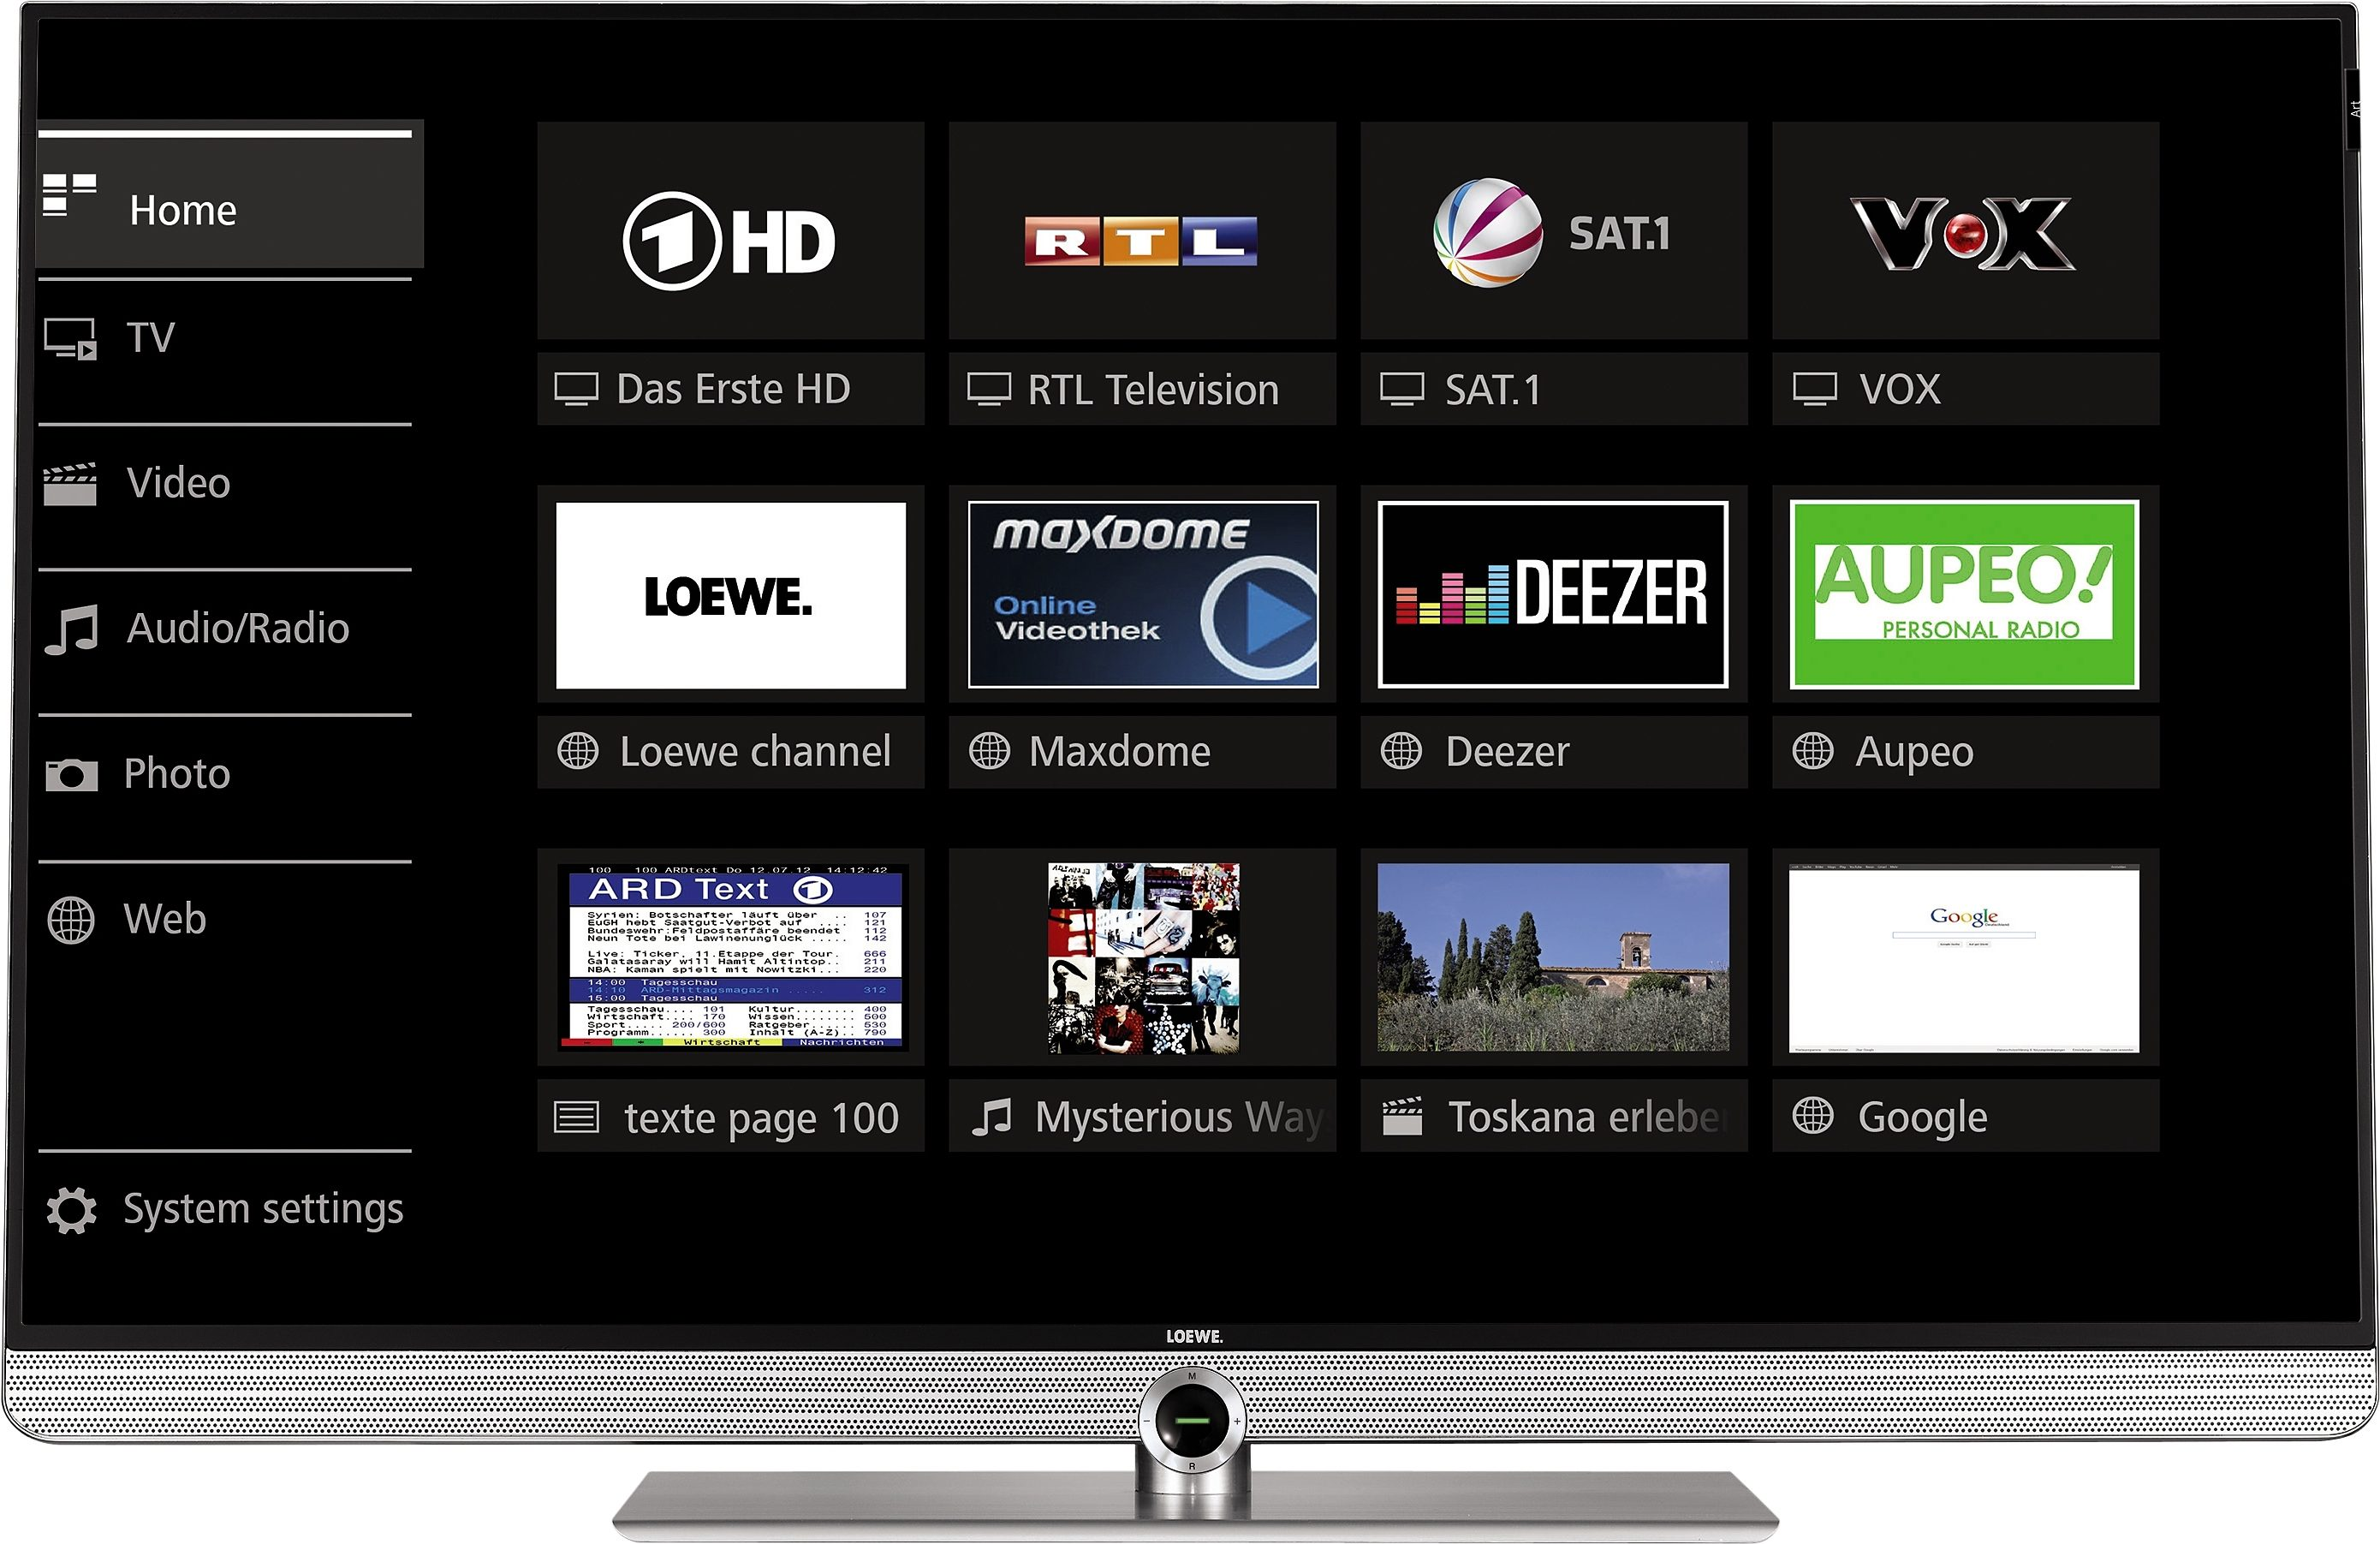 Loewe Art 55, LED Fernseher, 140 cm (55 Zoll), 2160p (4K Ultra HD)